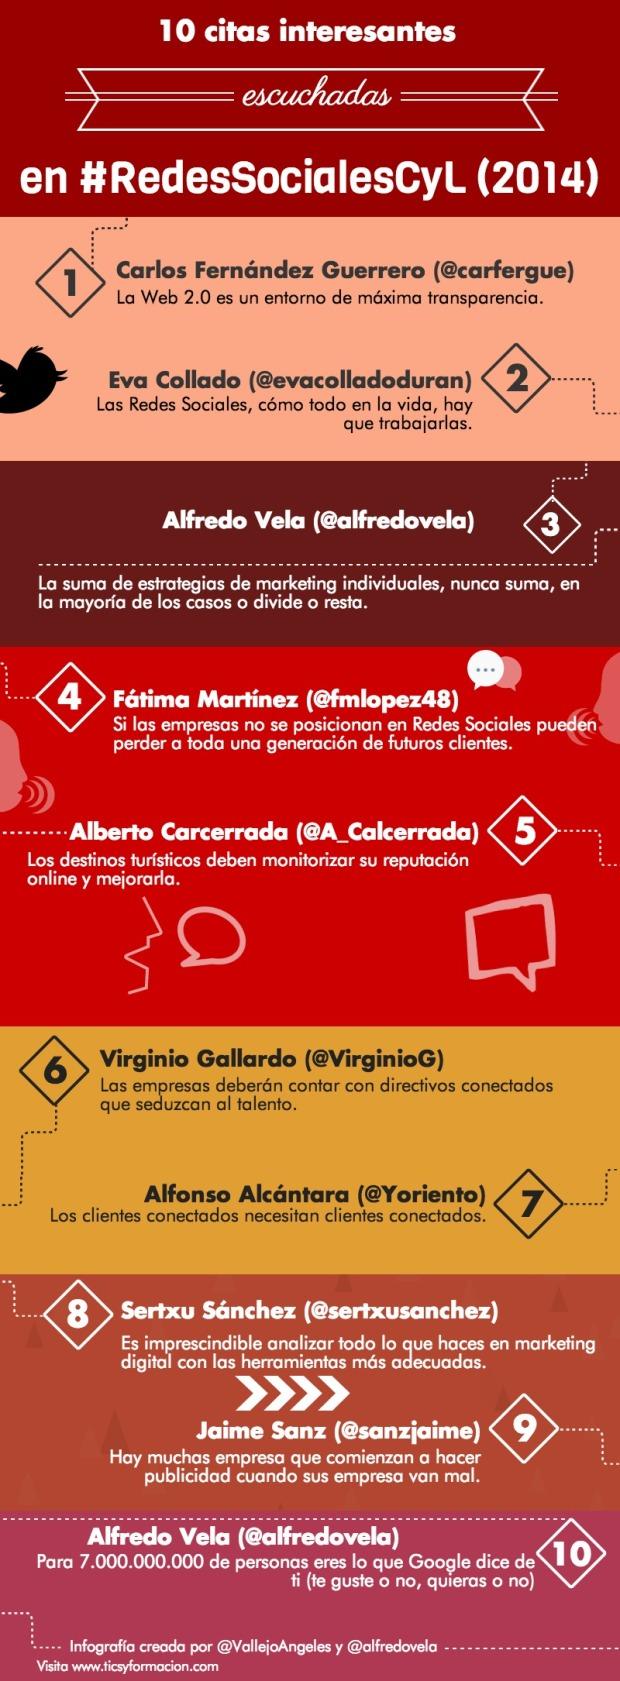 10 citas interesantes escuchadas en #RedesSociales#CyL 2014